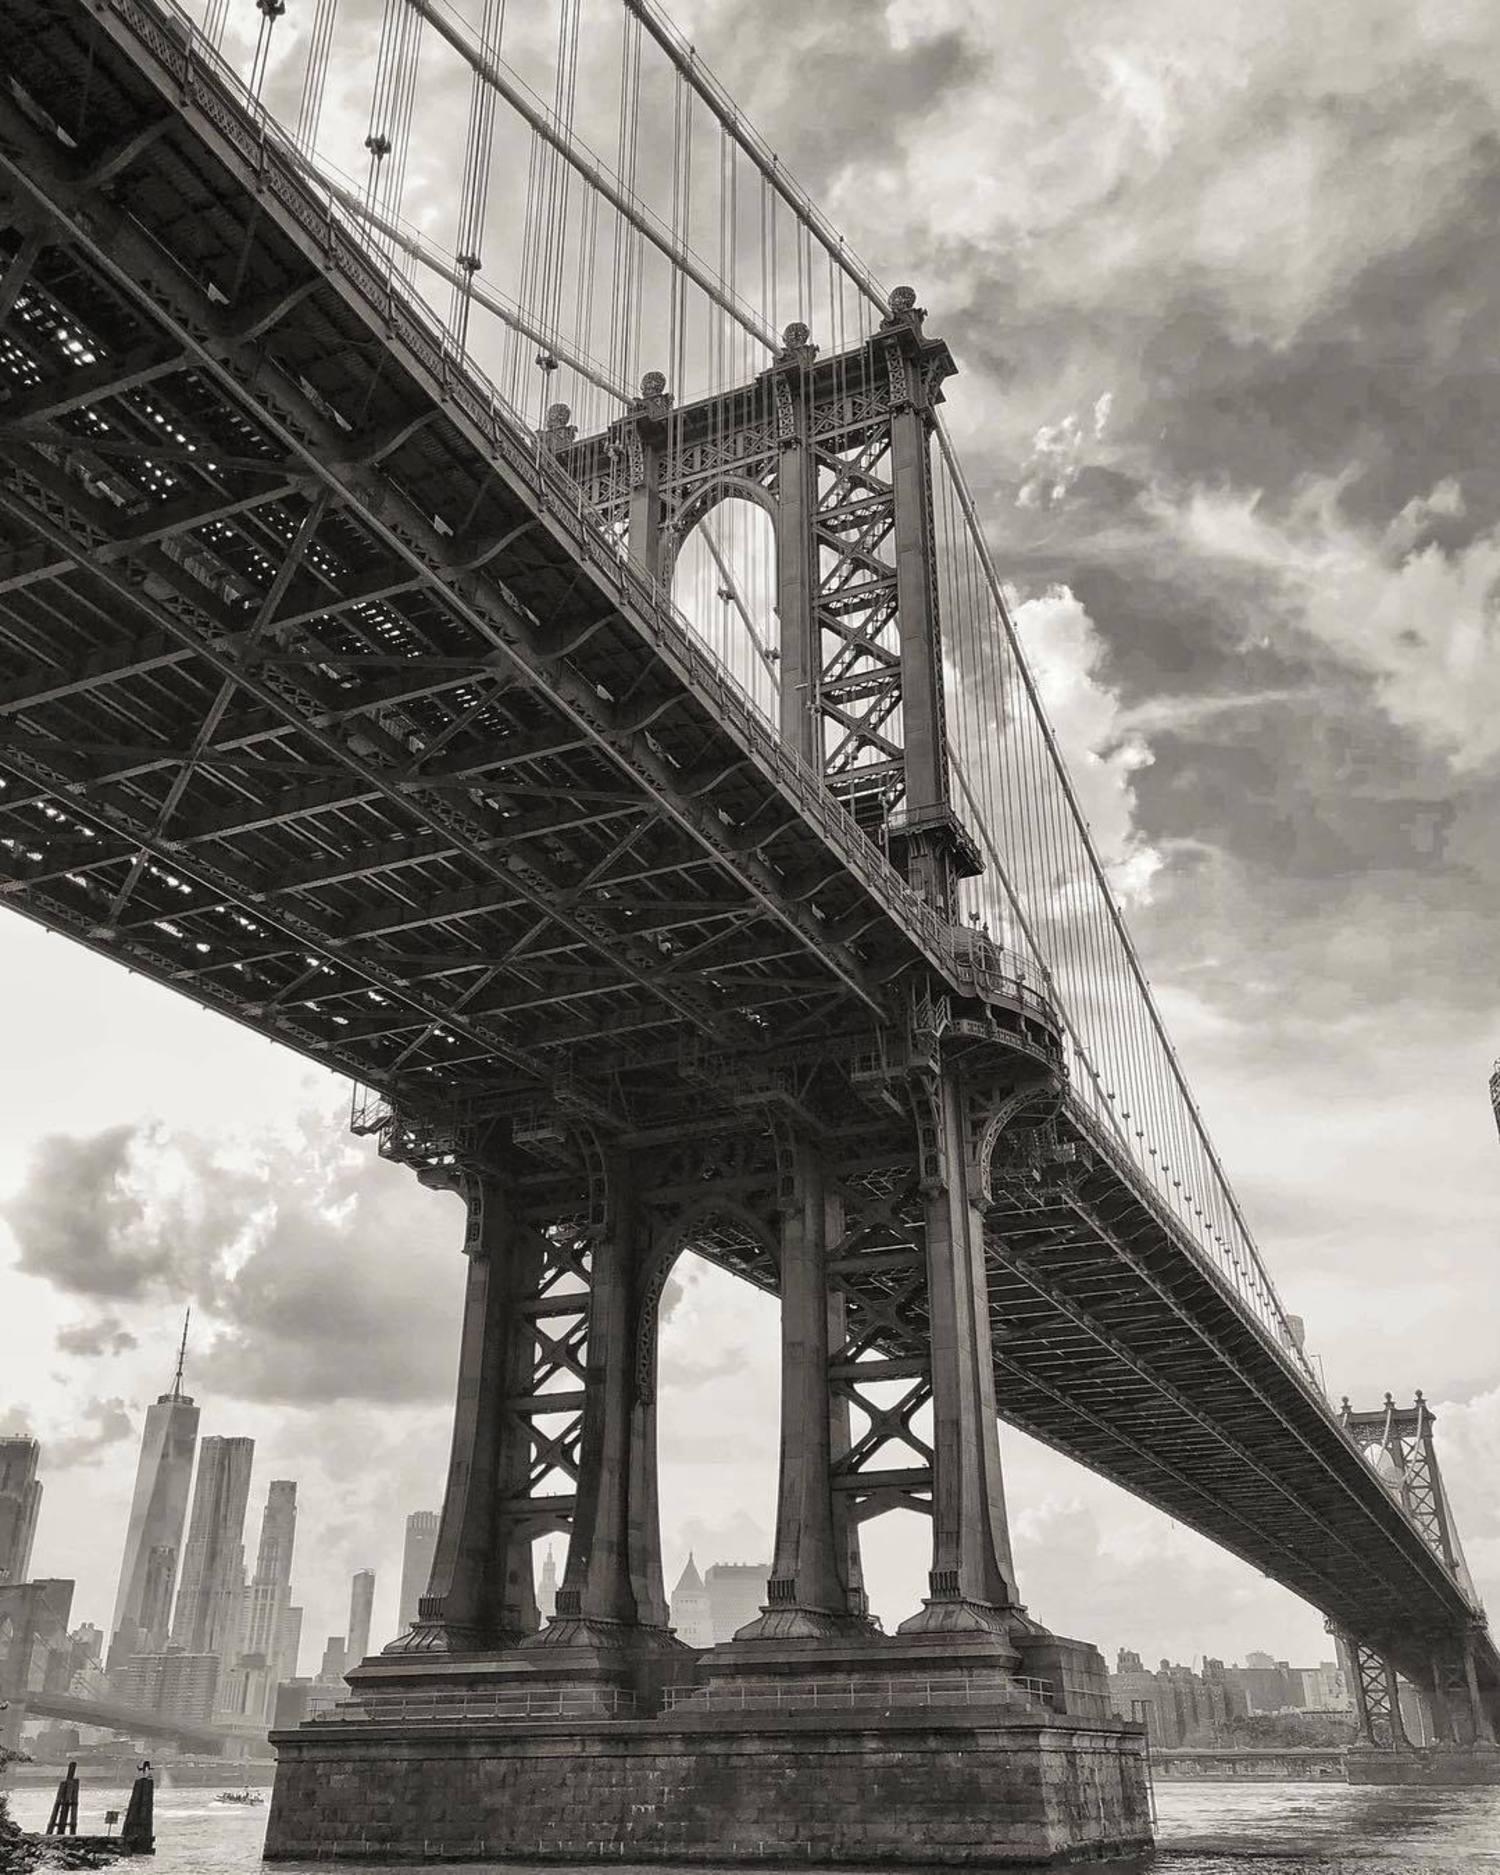 Manhattan Bridge, Brooklyn. Photo via @sue.aroundnyc #viewingnyc #newyork #newyorkcity #nyc #manhattanbridge